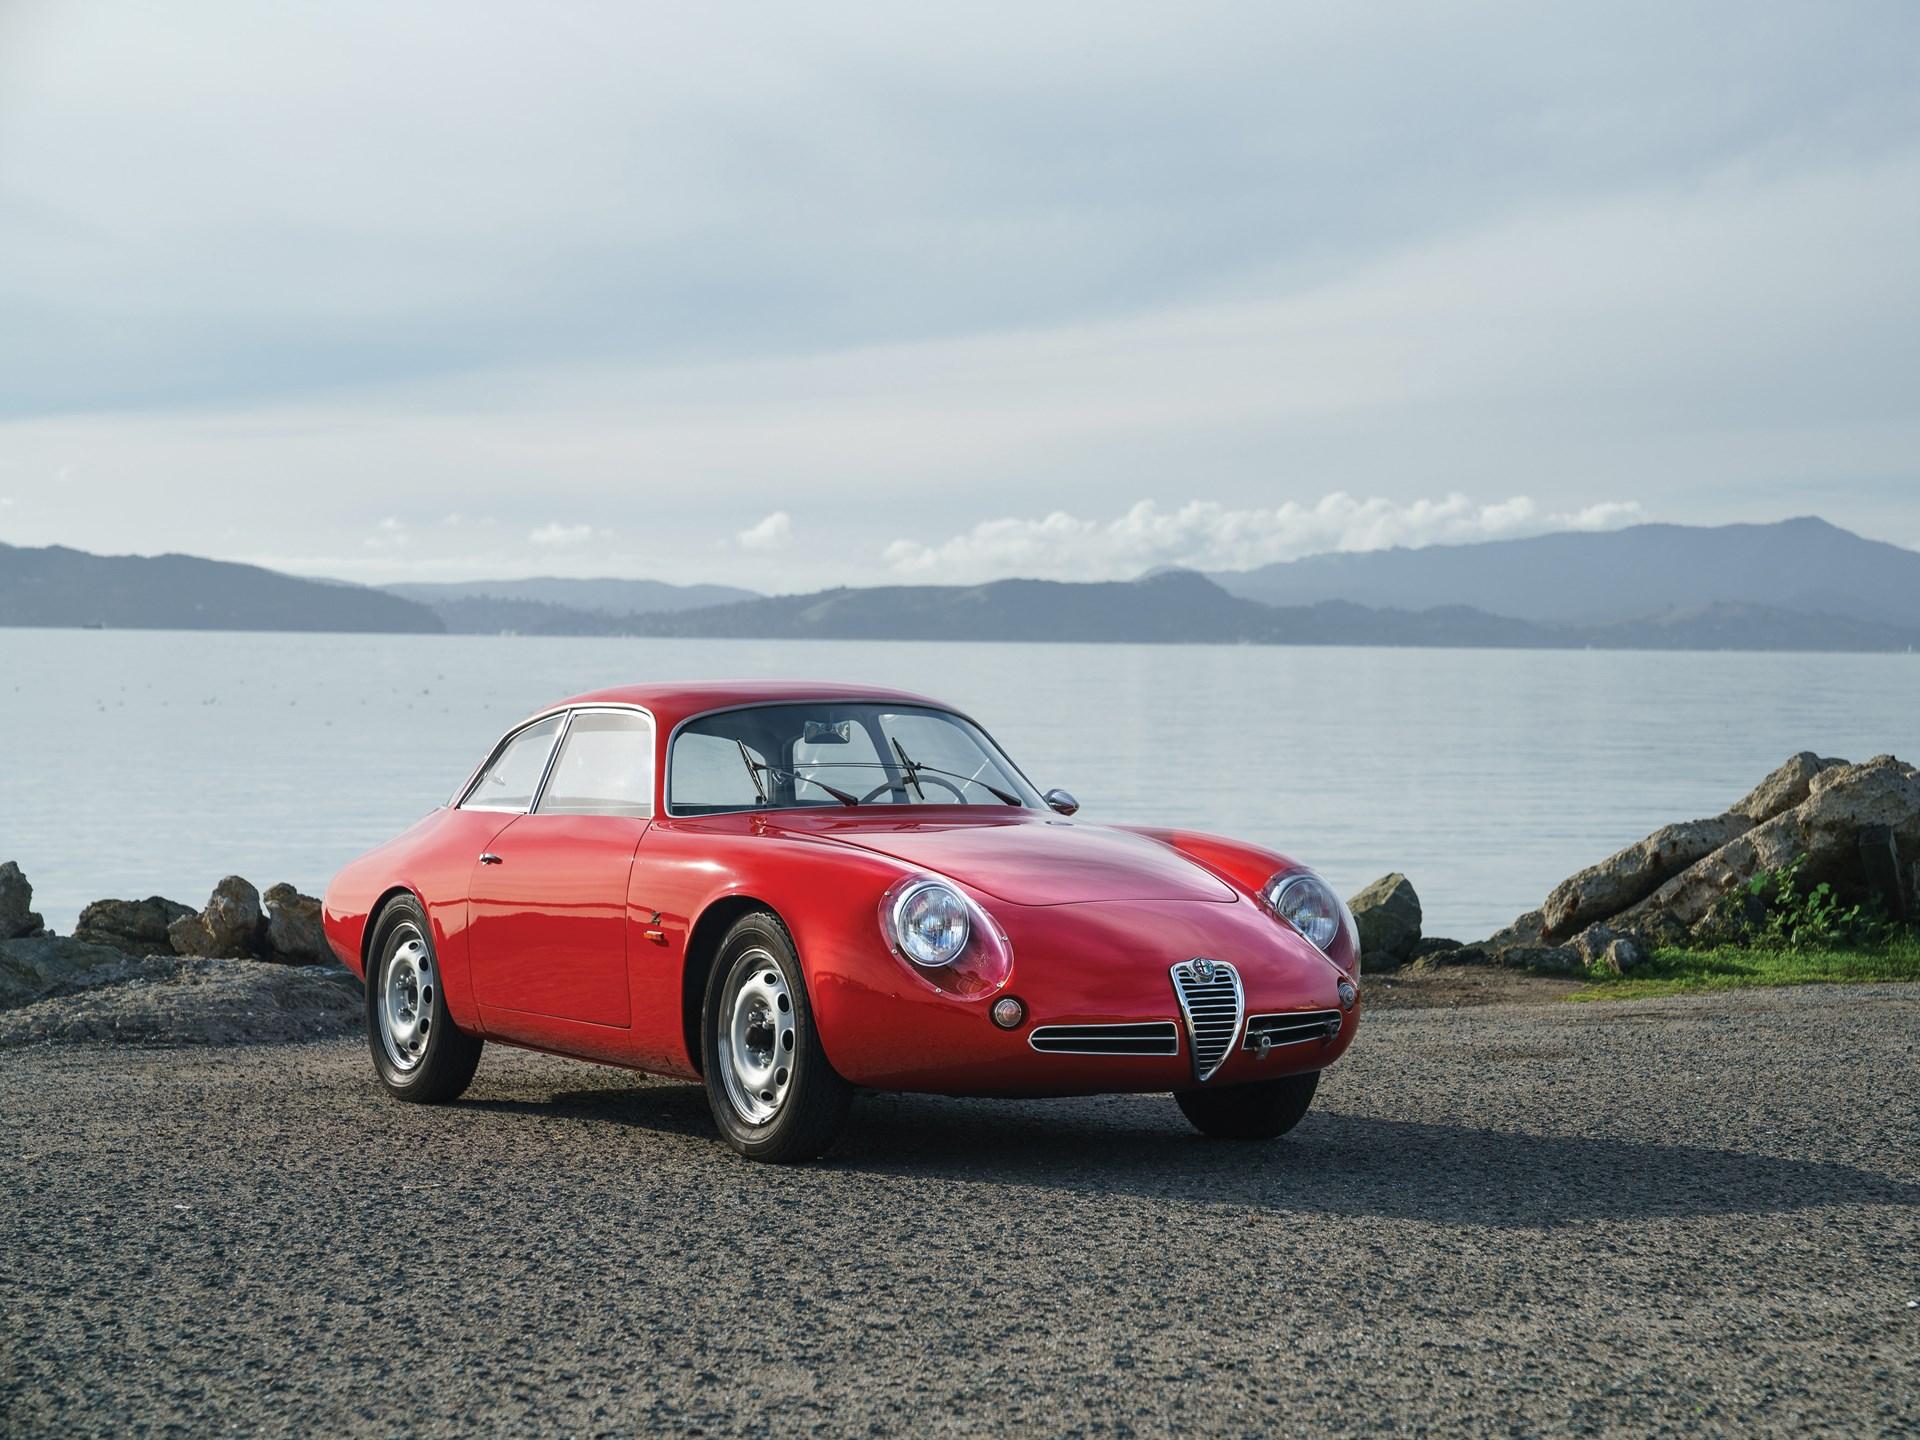 RM Sotheby s 1962 Alfa Romeo Giulietta SZ II Coda Tronca by